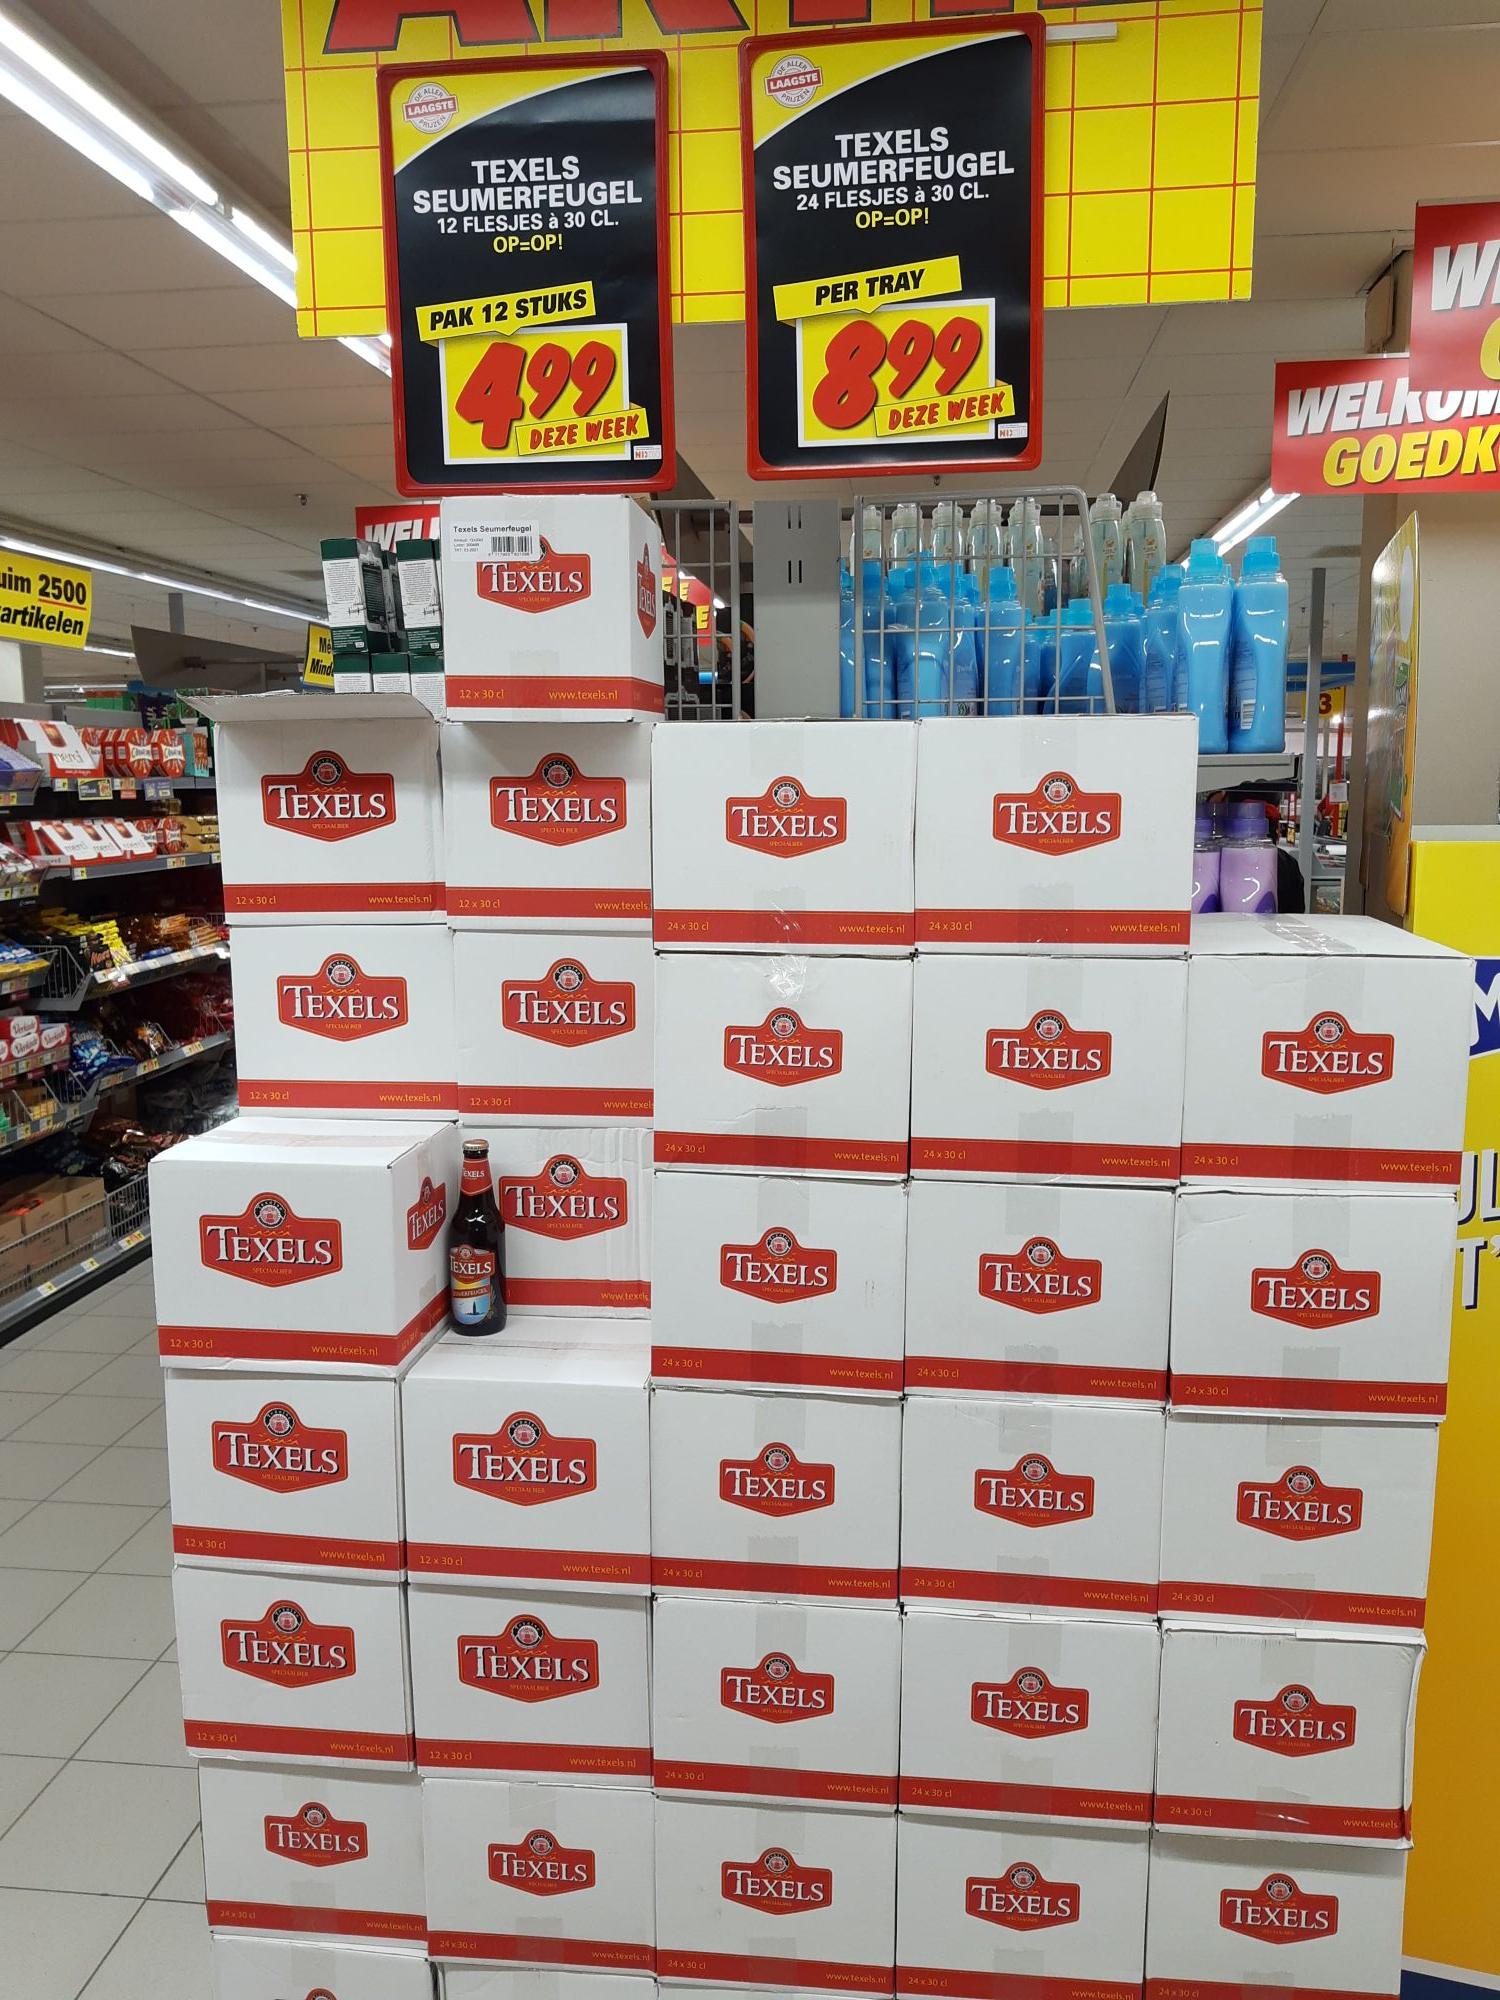 Texels Seumerfeugel 12 of 24 flesjes